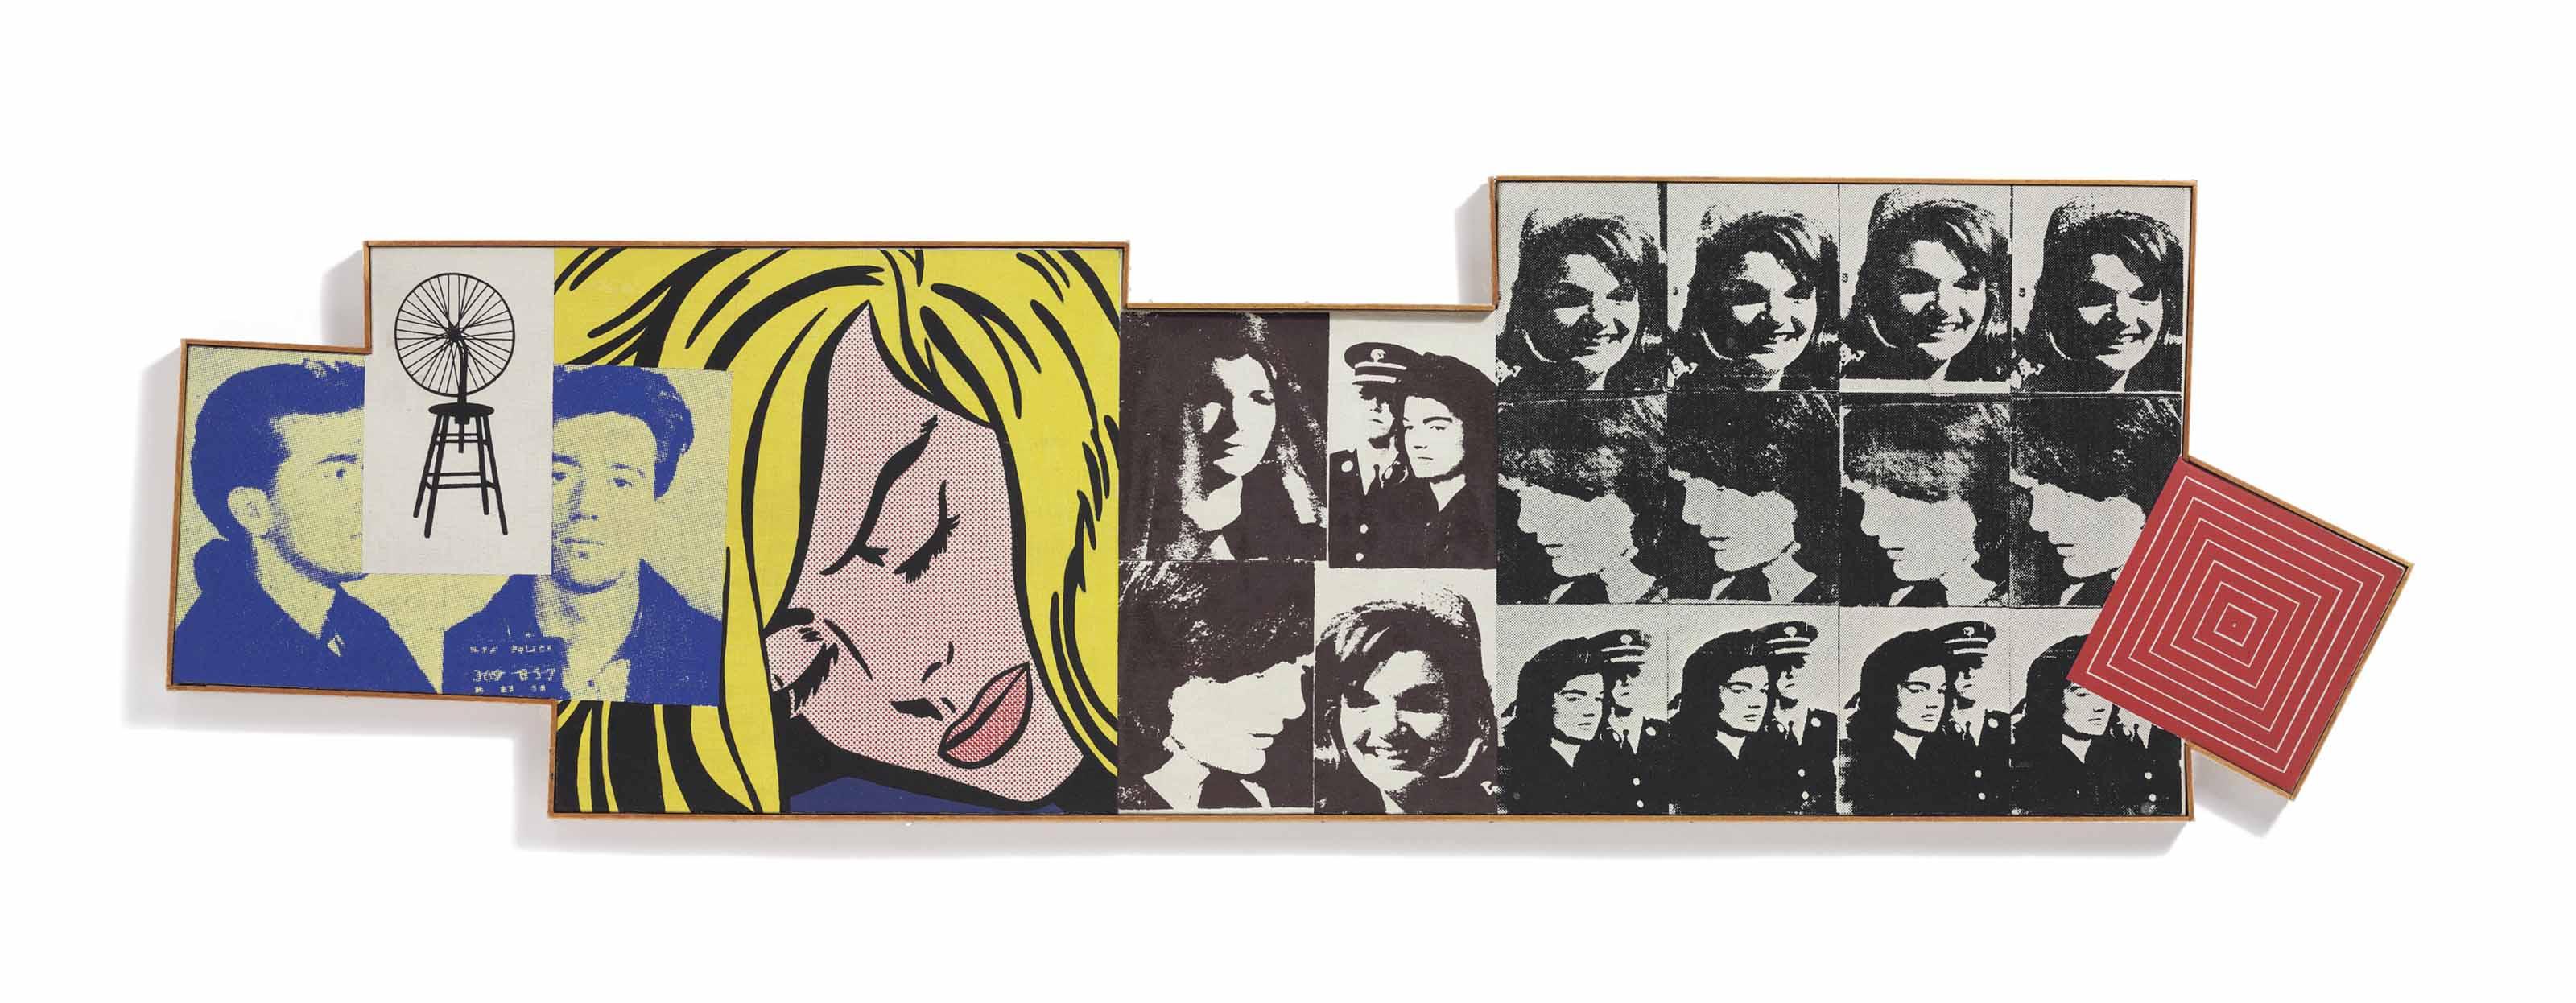 "Marcel Duchamp, ""Bicycle Wheel,"" 1913; Andy Warhol, ""Most Wanted Man,"" 1964; Roy Lichtenstein, ""Sleeping Girl,"" 1964; Andy Warhol, ""16 Jackies,"" 1964; and Frank Stella, ""Island #10,"" 1962"